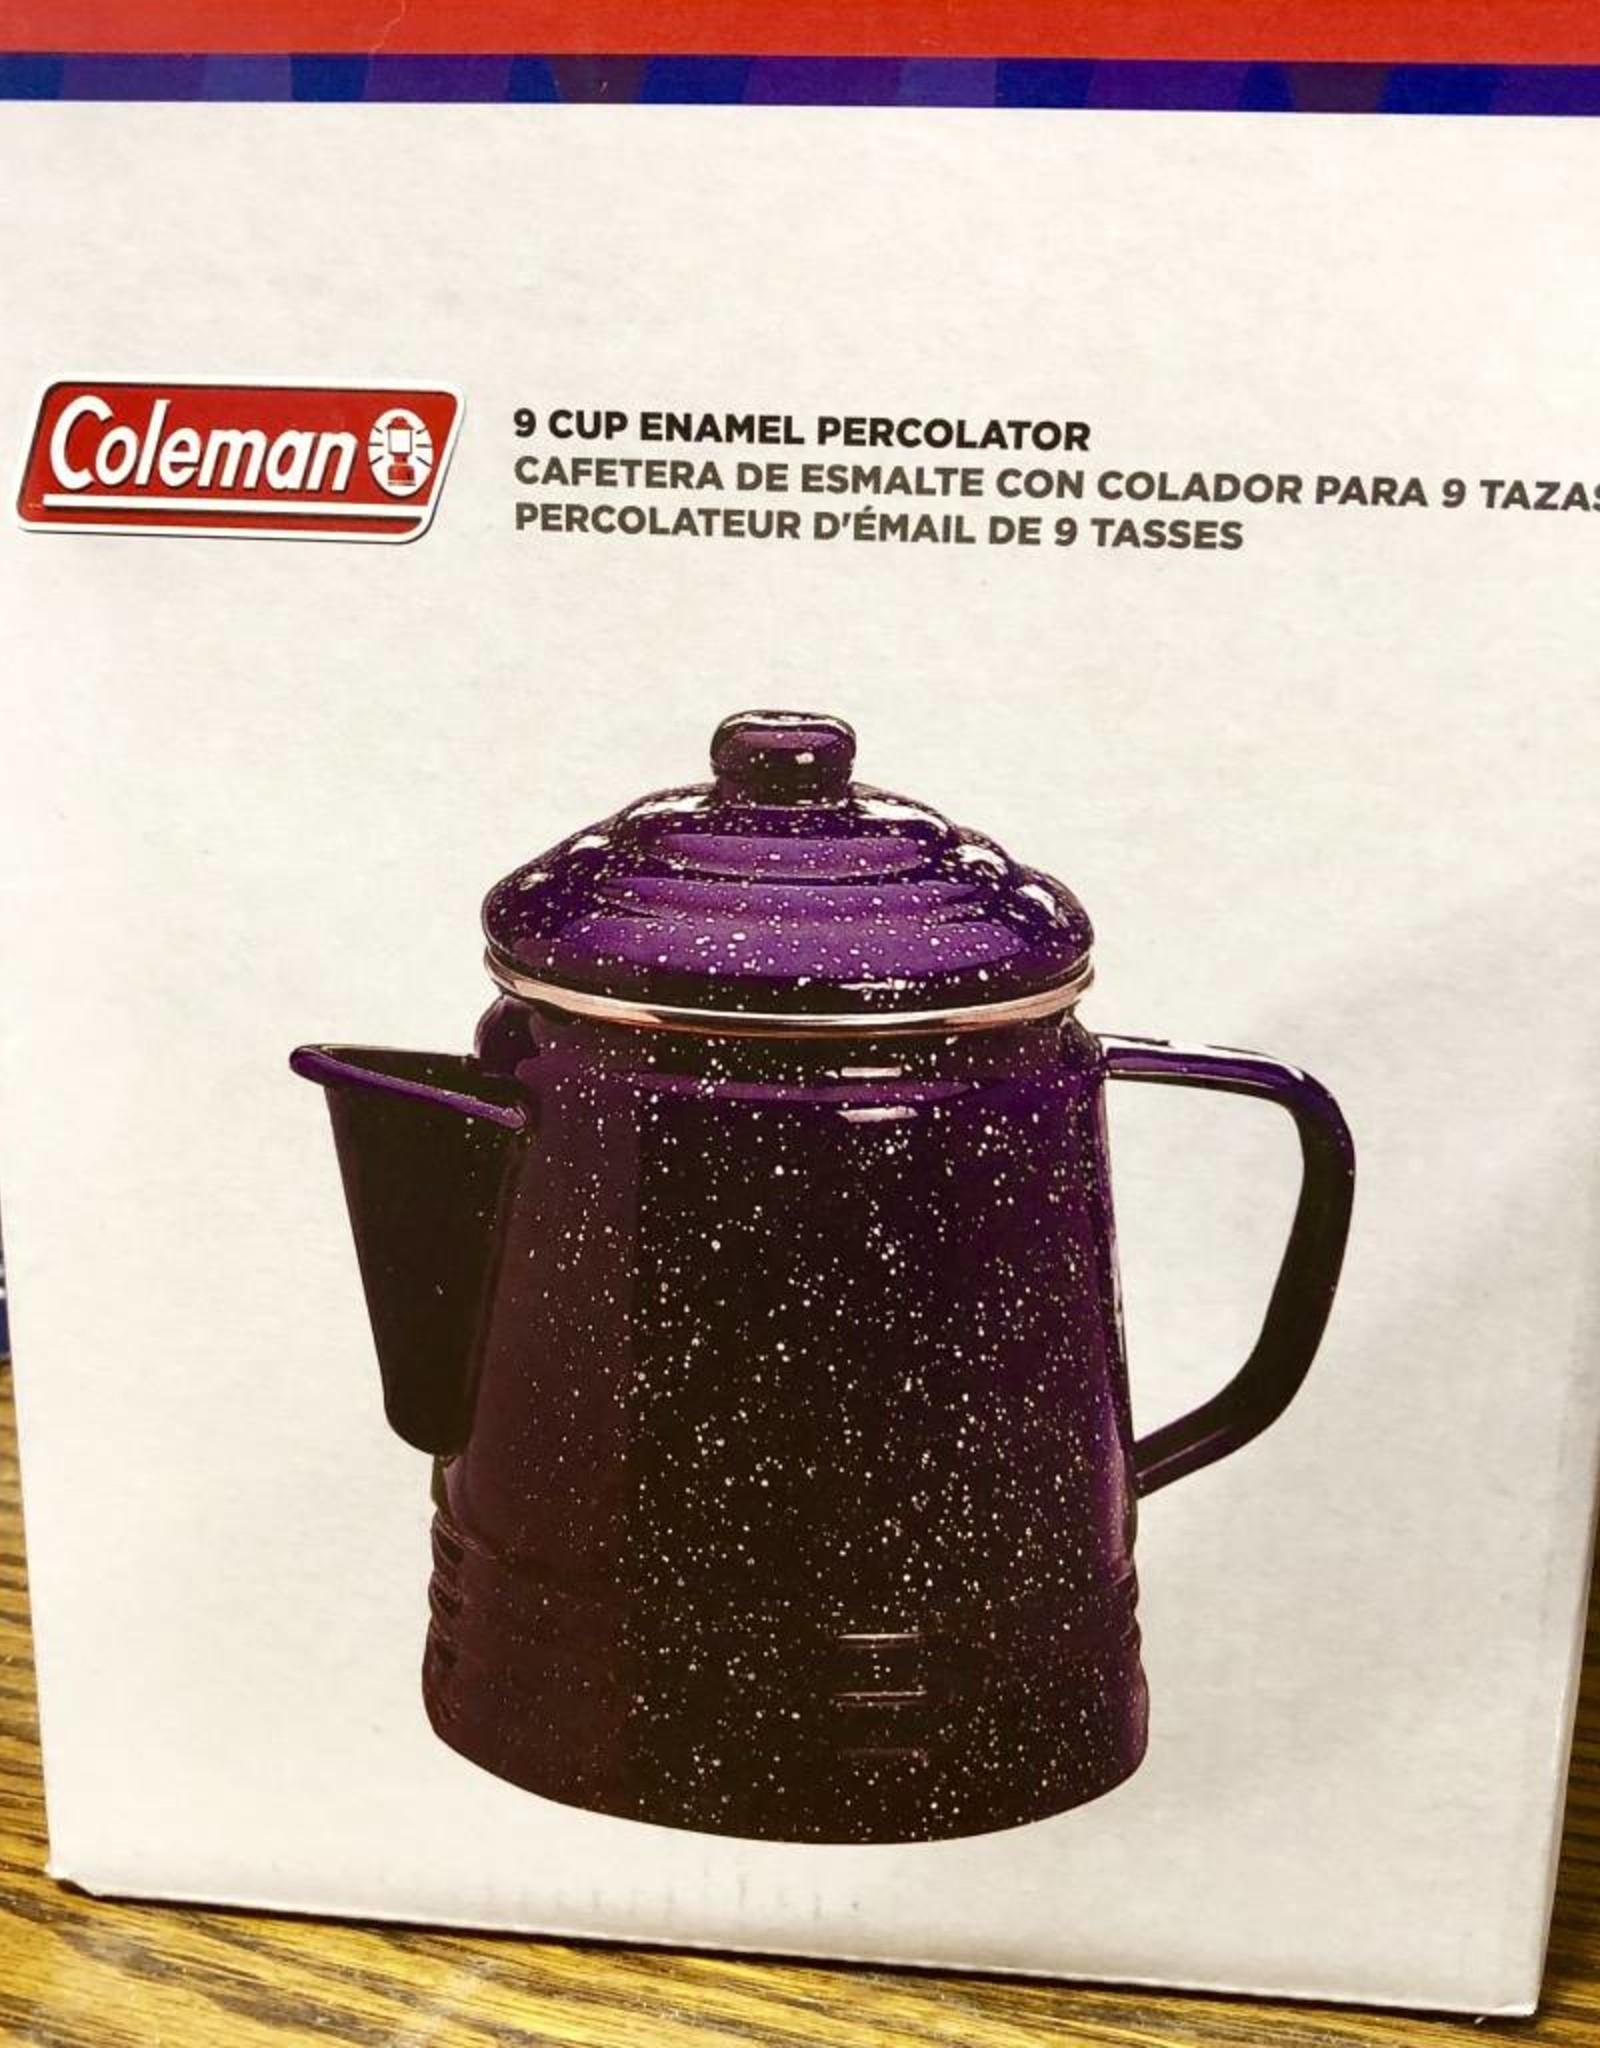 PERCOLATOR COFFEE POT ENAMEL CAMP COLEMAN 9 CUP